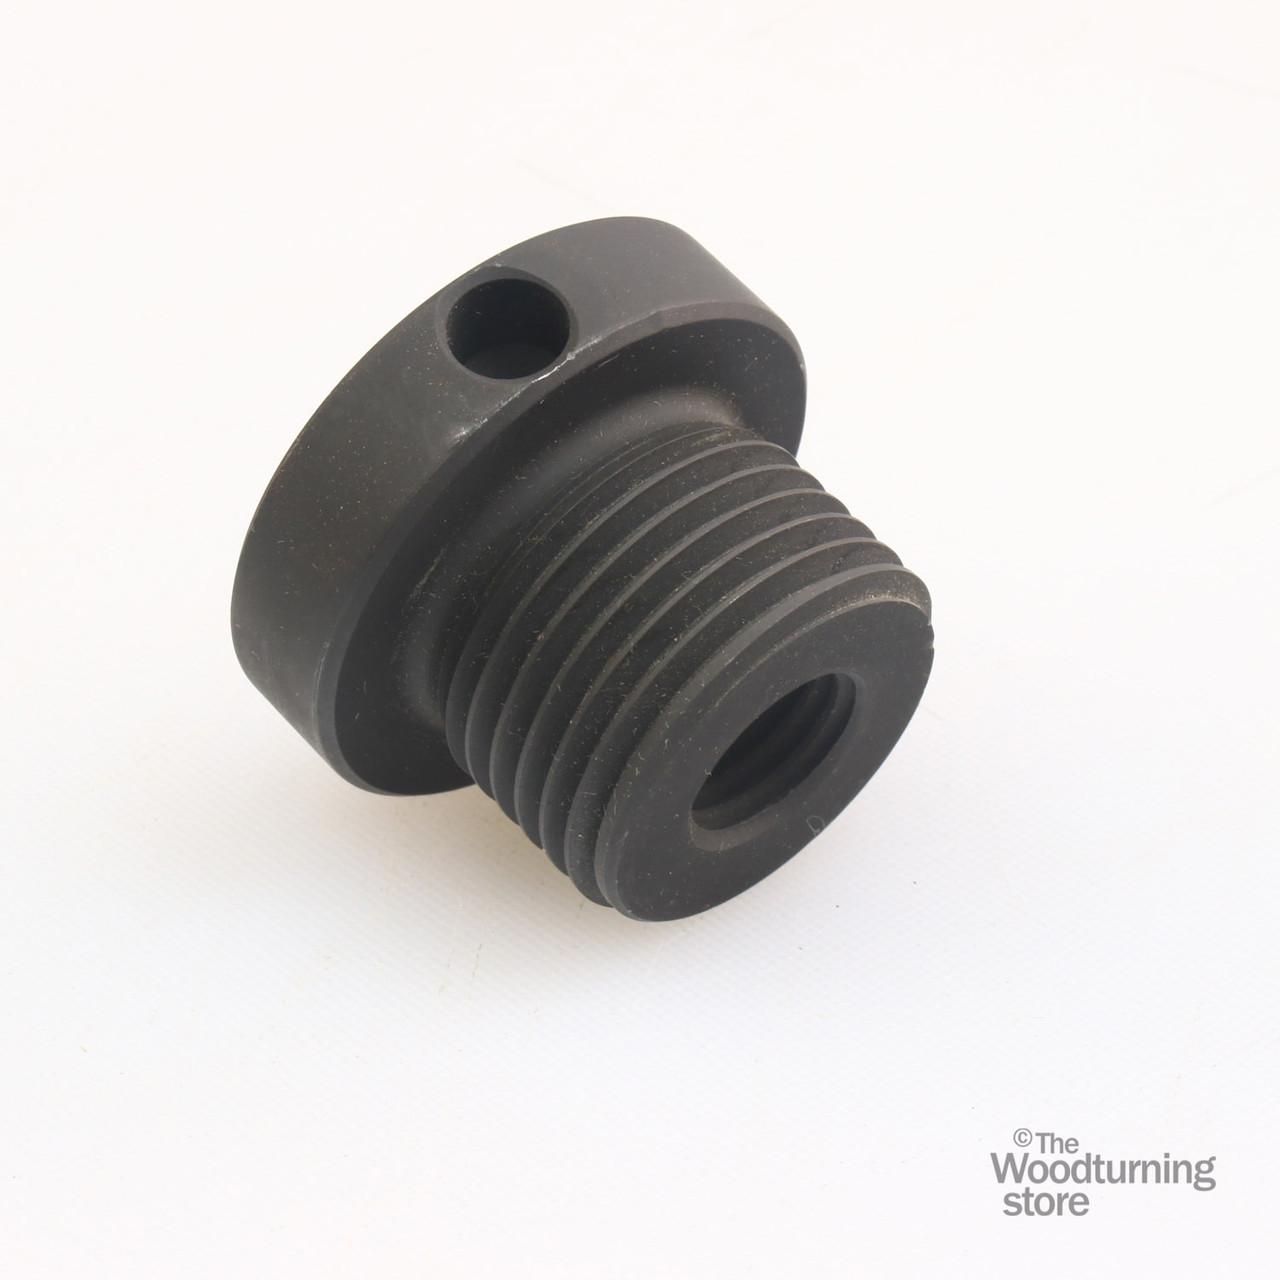 4mm Shank Diameter Micro 100 Solid Carbide Tool No Cutting Radius Right Hand Boring Tool 10mm Maximum Bore Depth BBM-040210 50mm Overall Length 0.50mm Projection Metric Dimensions 2mm Minimum Bore Diameter